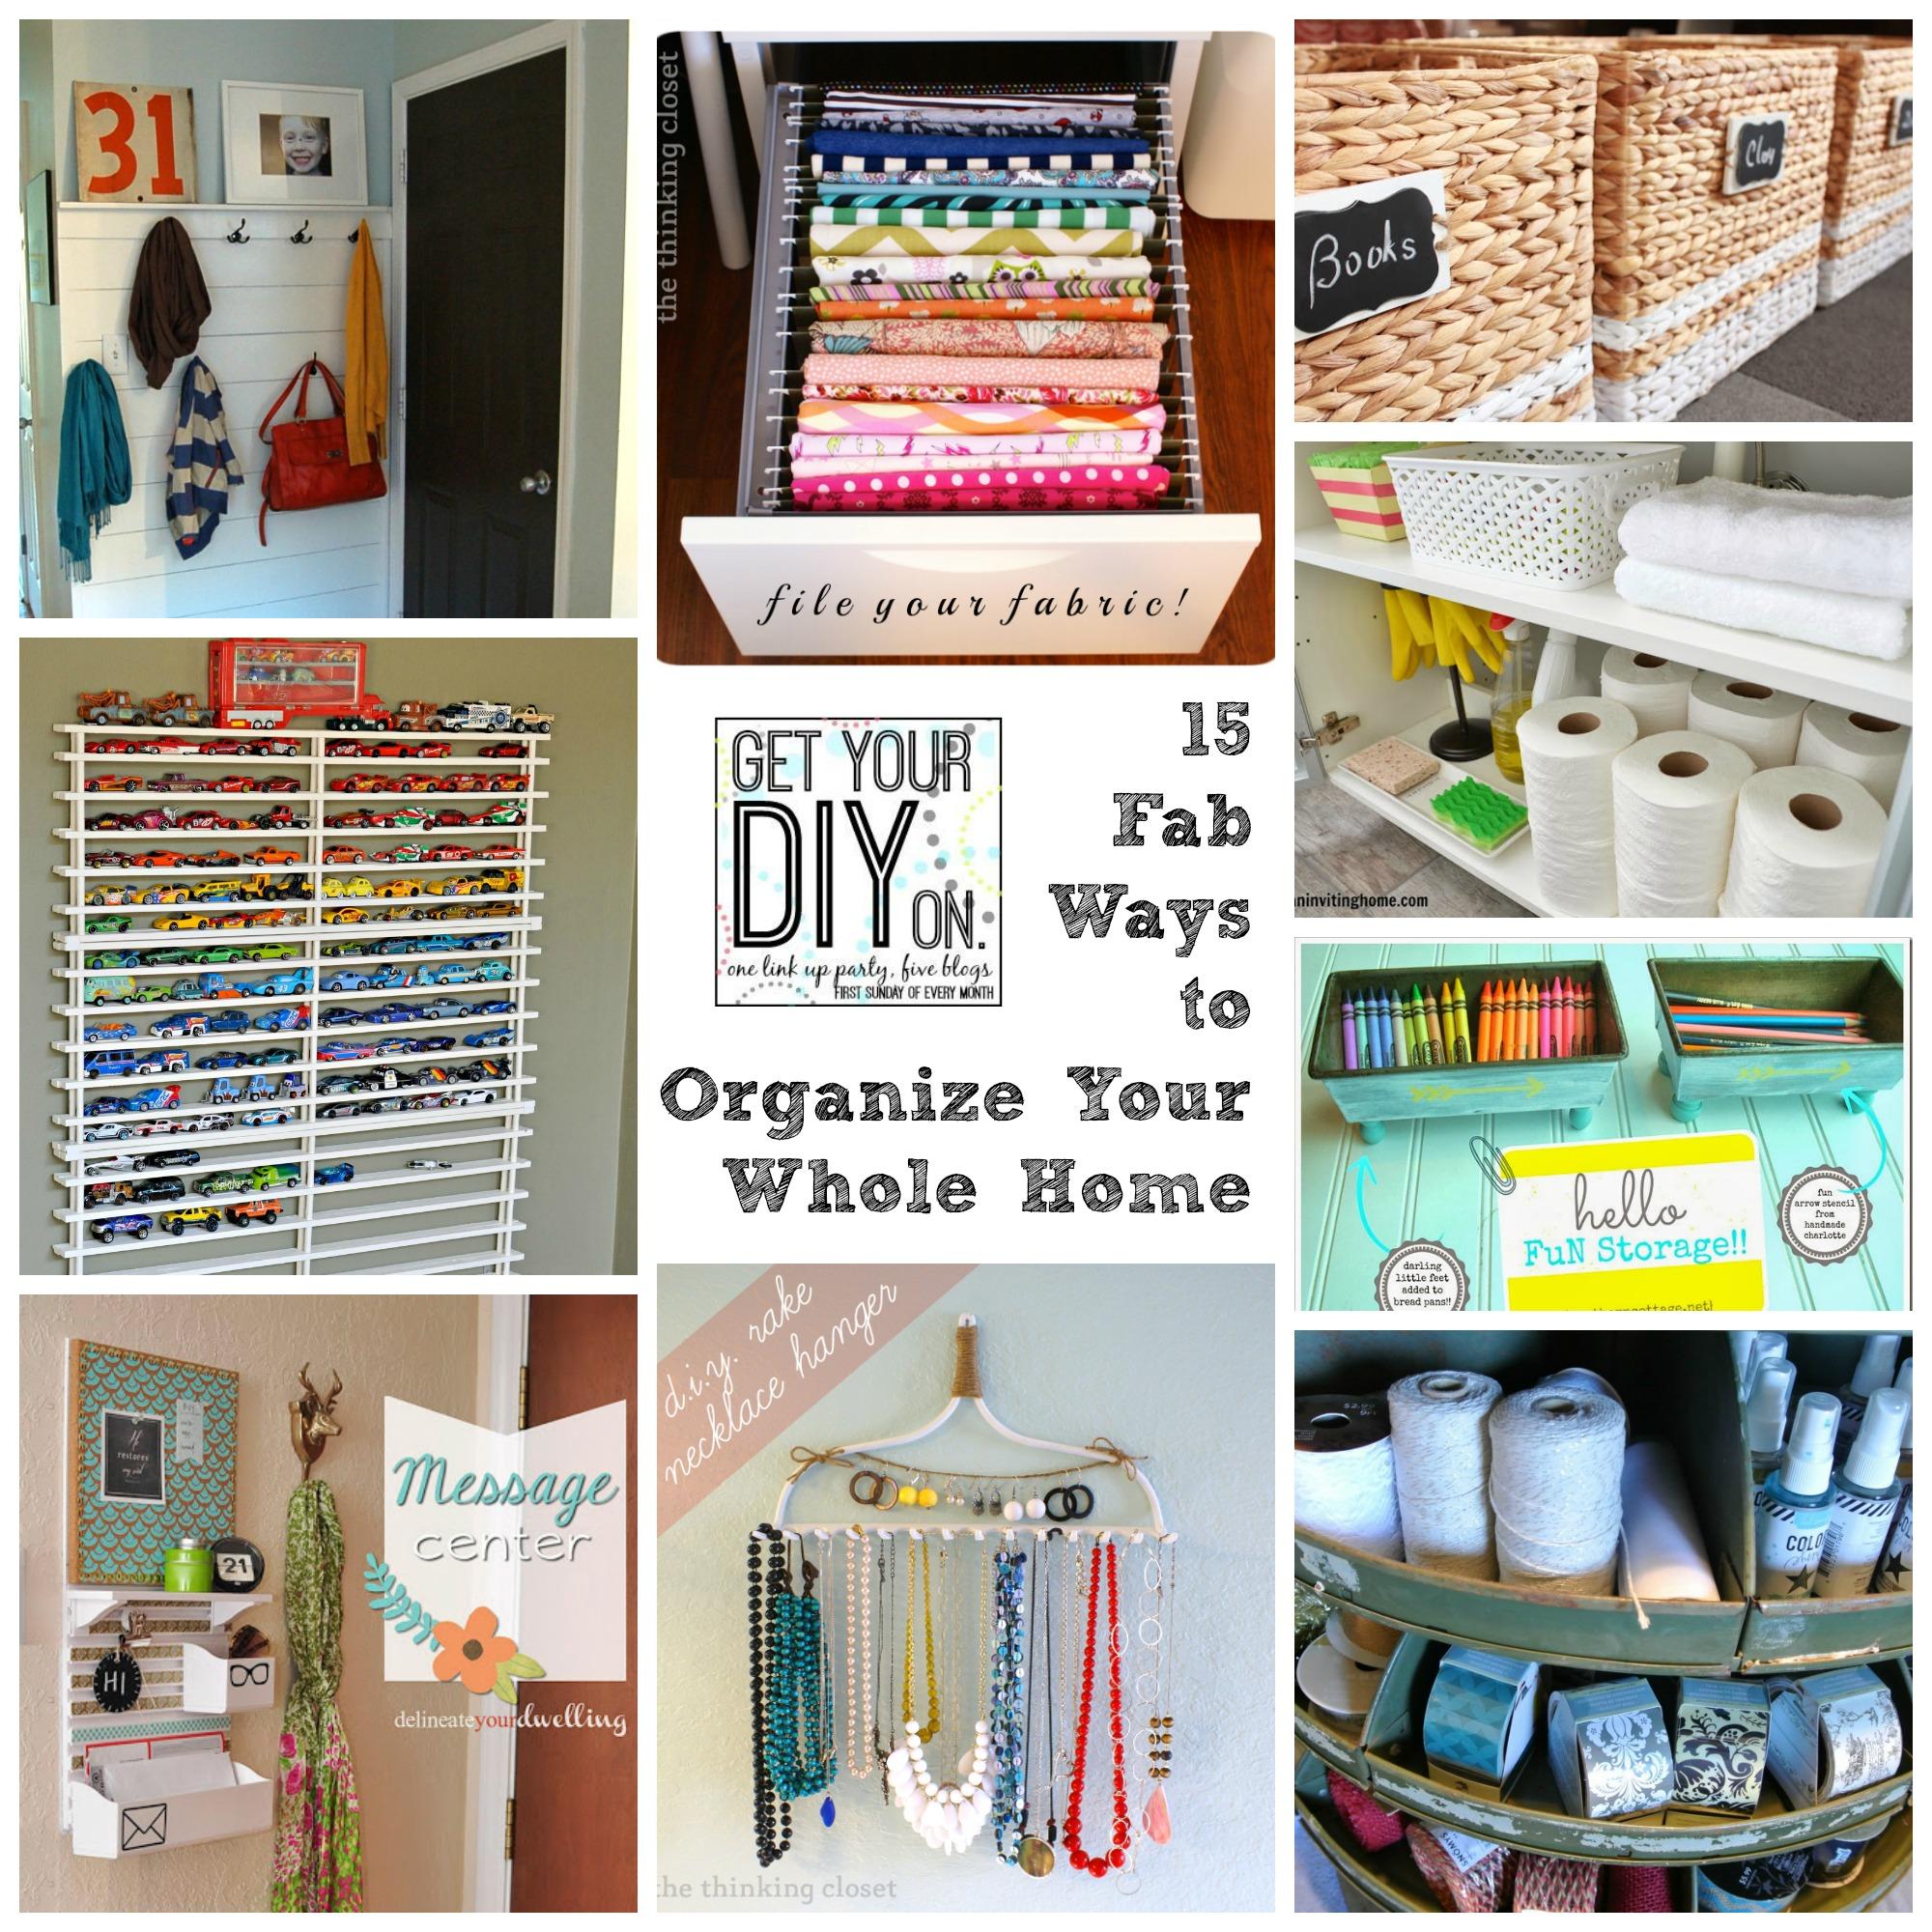 fabulous organizing ideas house diy challenge laundry room storage ideas bathroom laundry room ideas